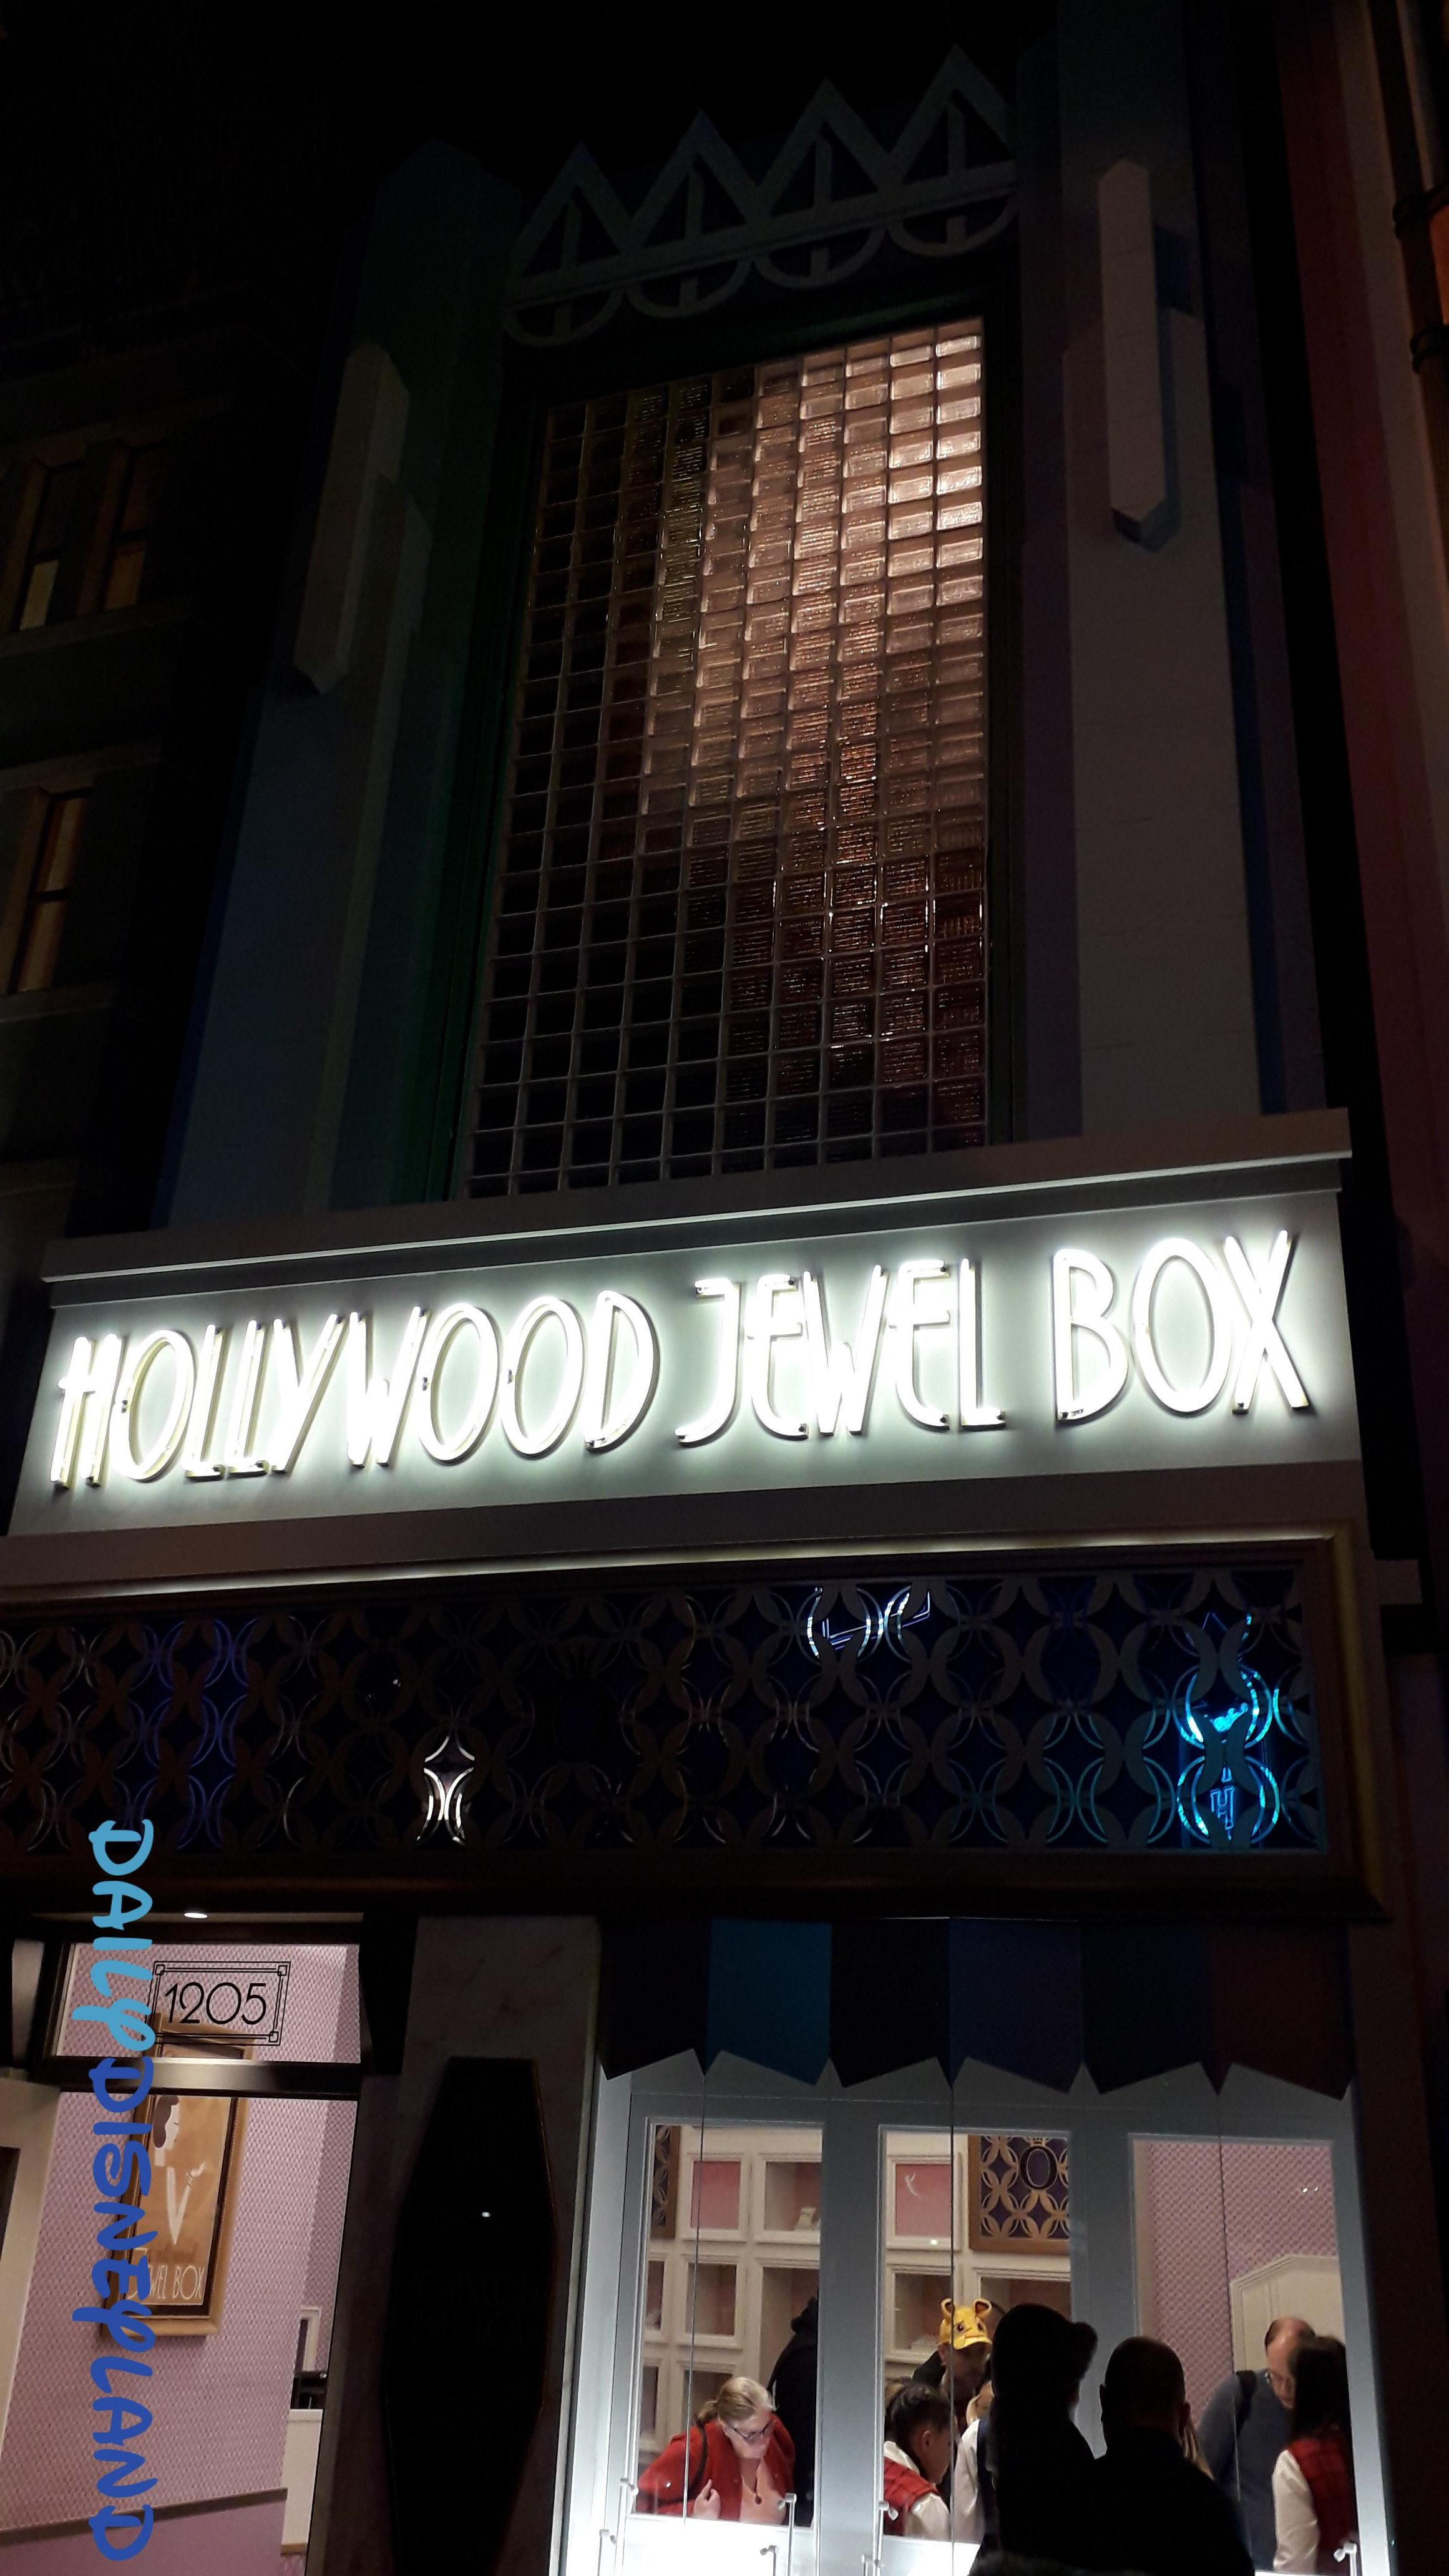 hollywood jewel box la nouvelle boutique par pandora. Black Bedroom Furniture Sets. Home Design Ideas